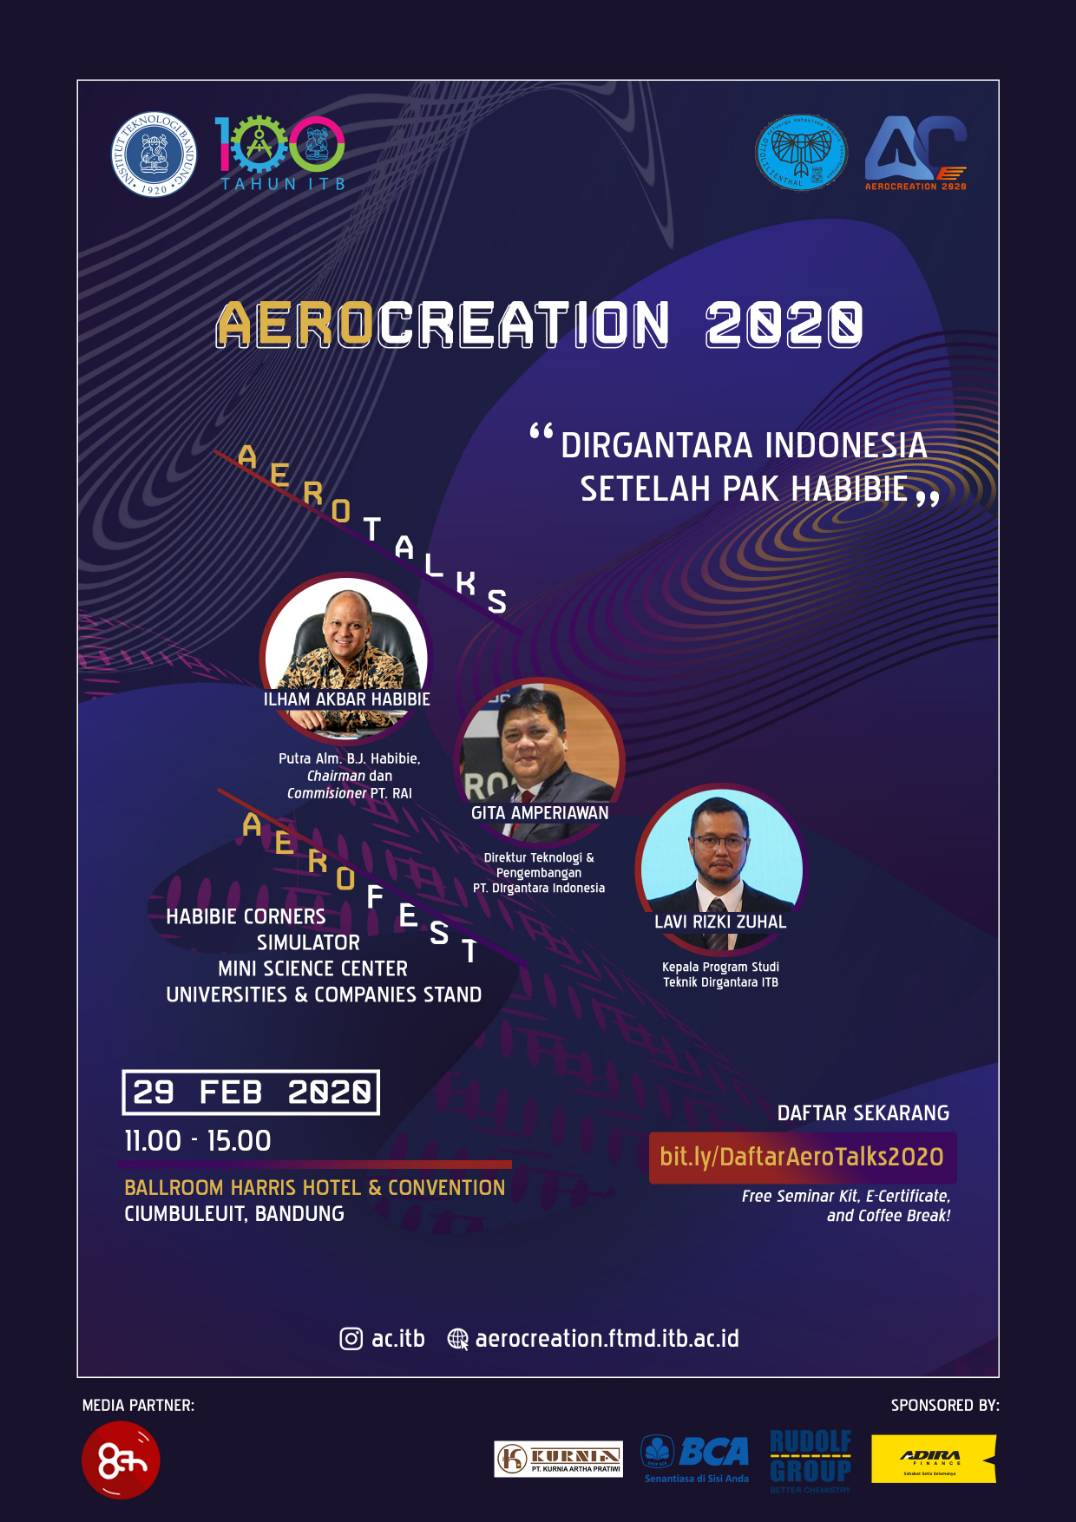 Terra Drone Indonesia pameran